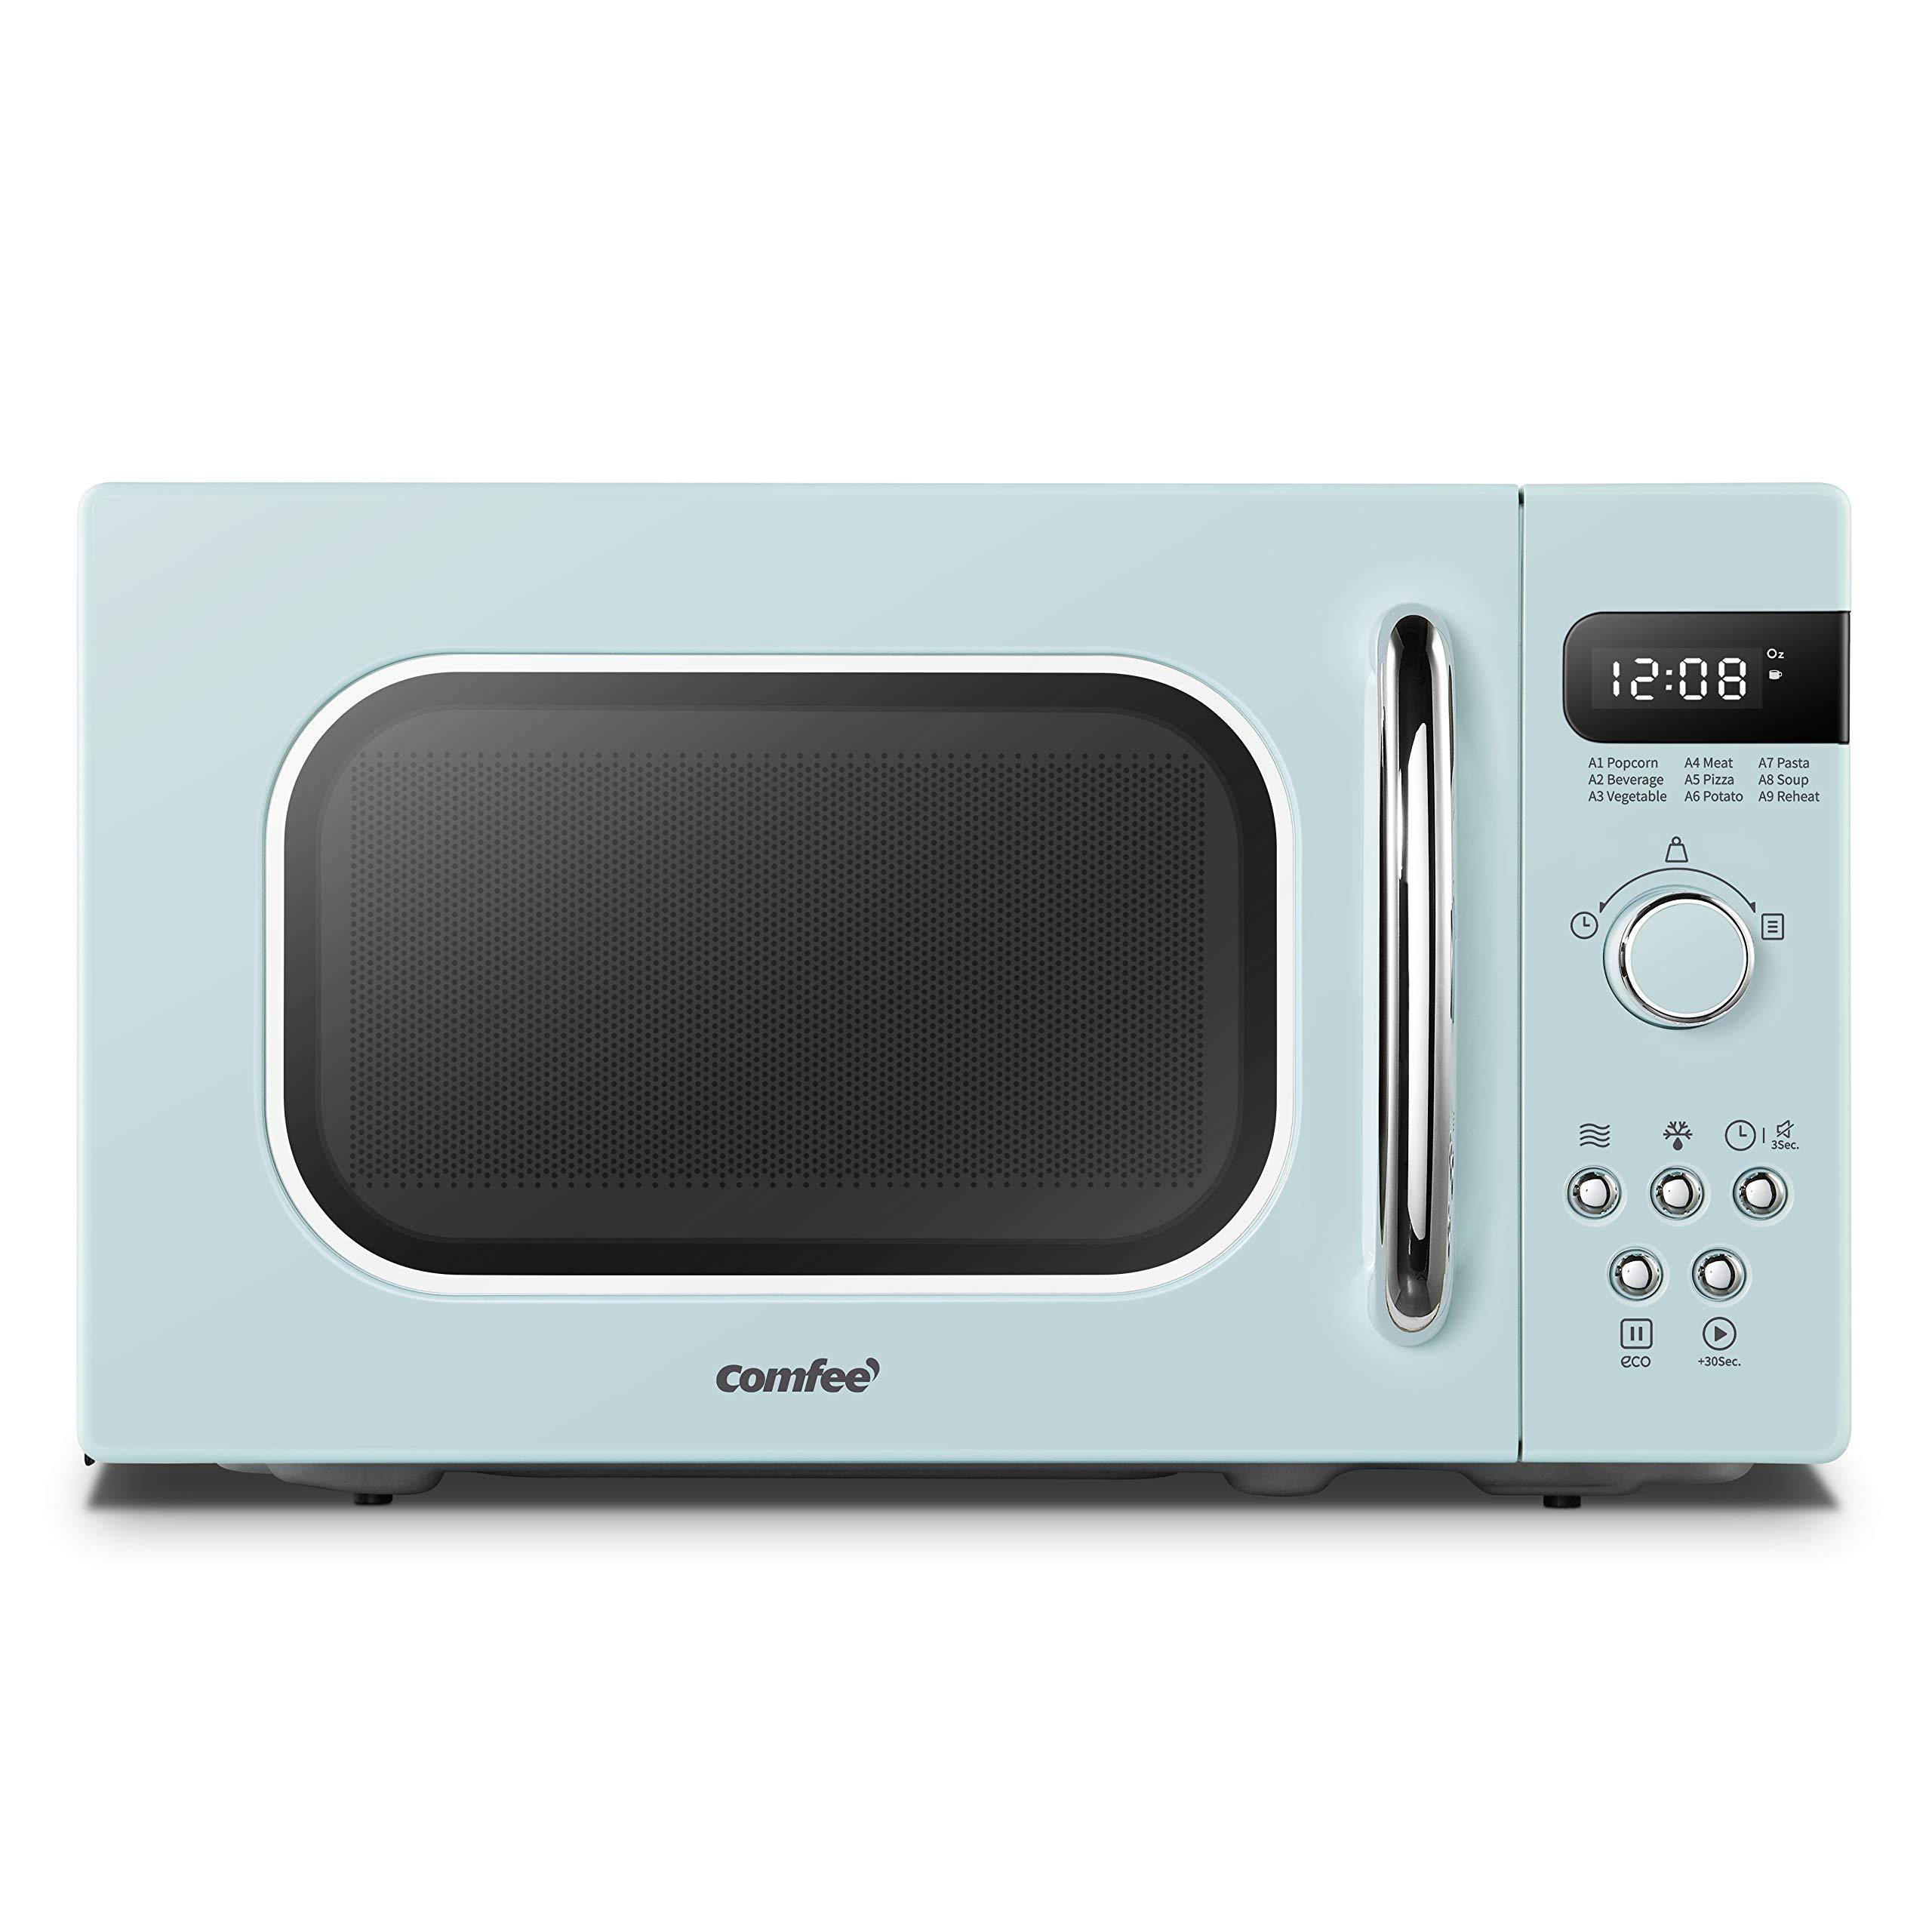 COMFEE AM720C2RA G Countertop Microwave Position Memory